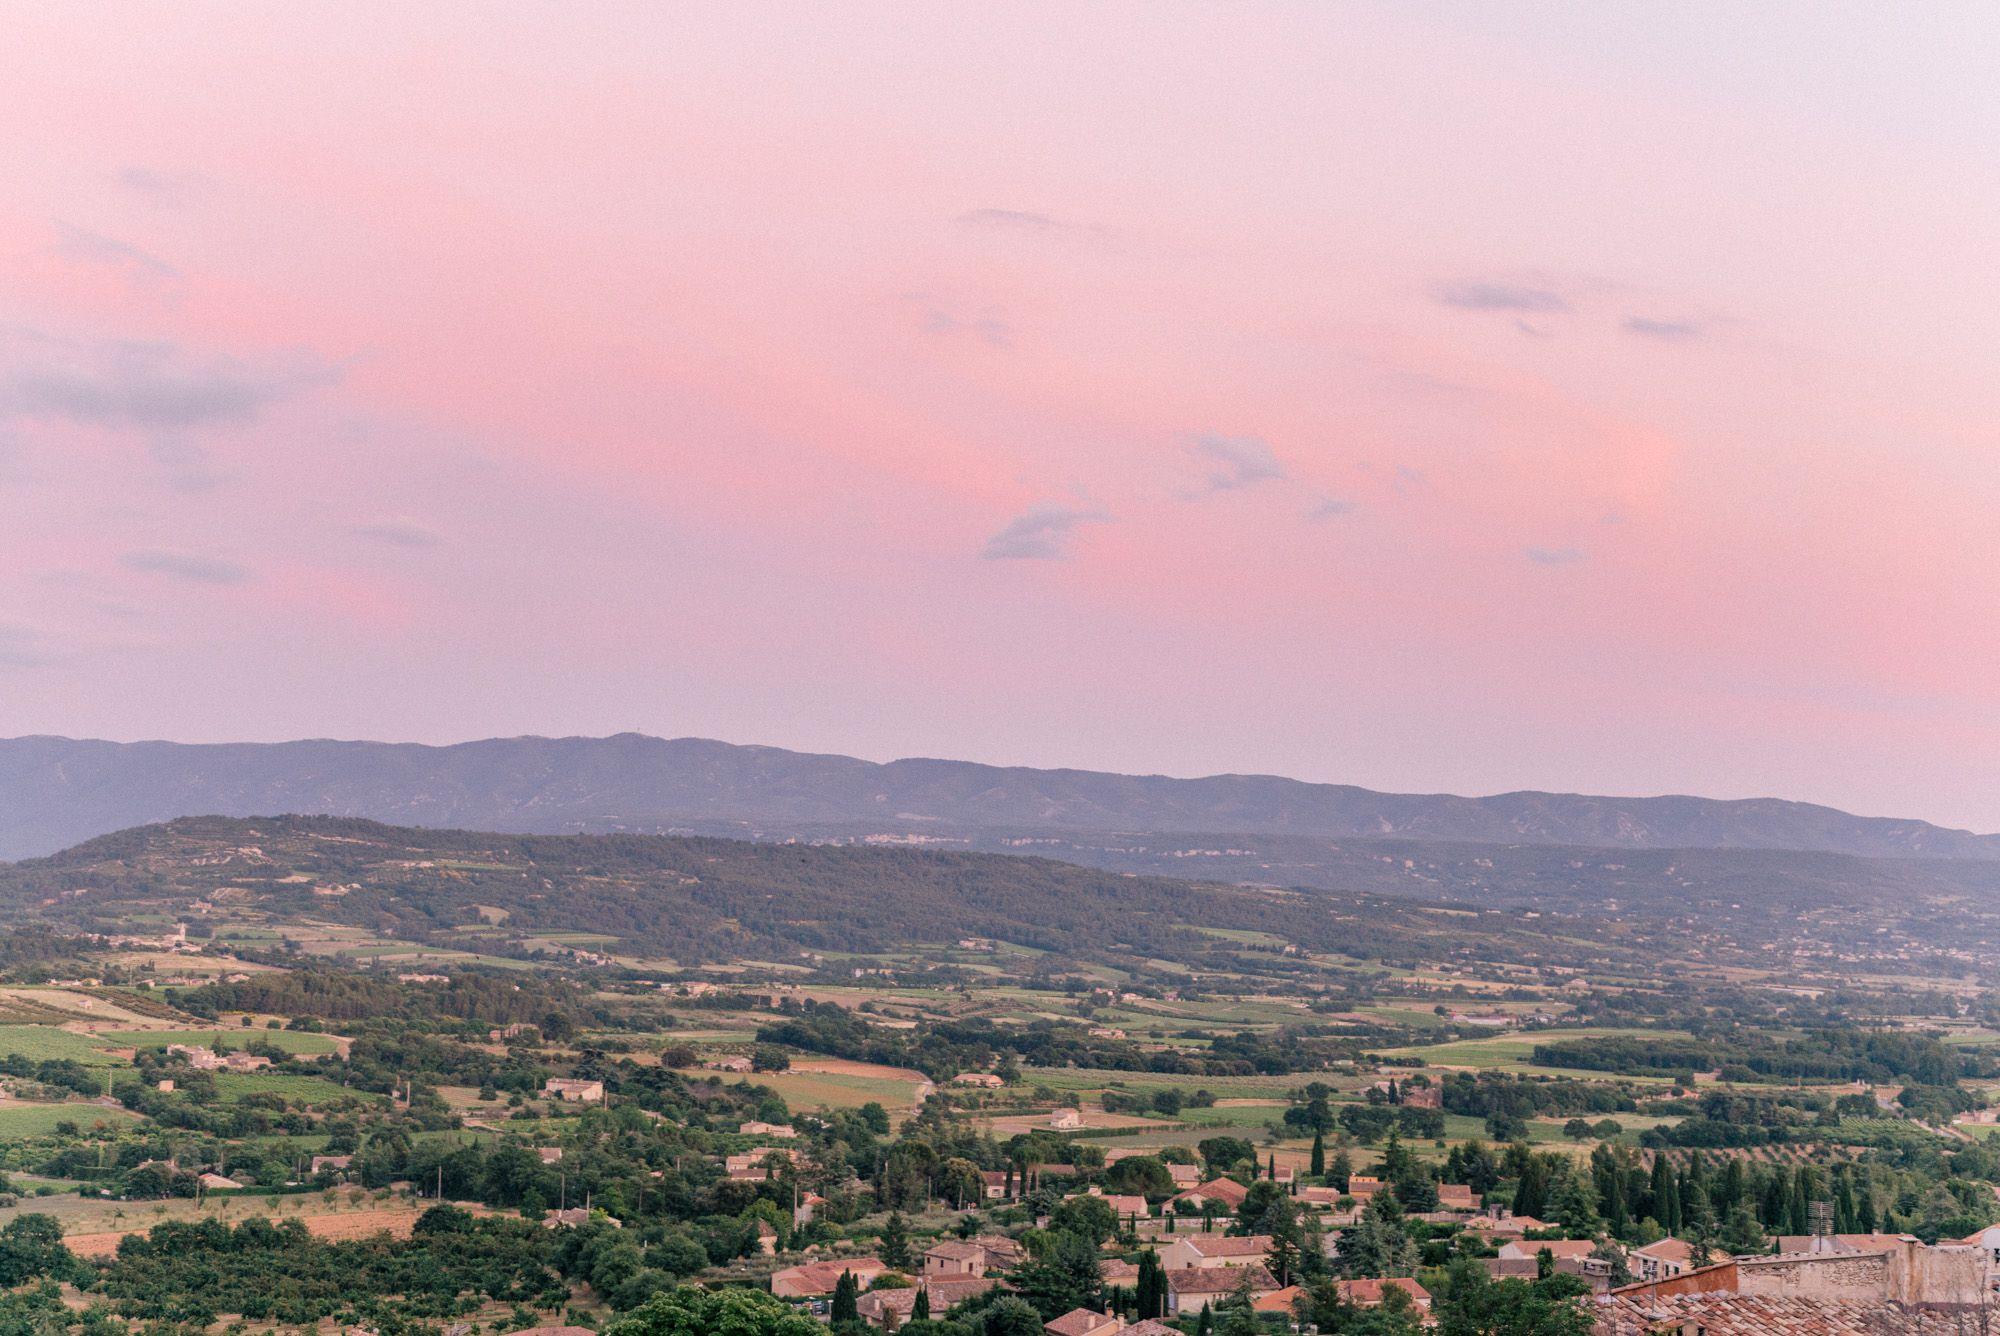 gmg-sunset-picnic-saint-saturnin-les-apt-1008558